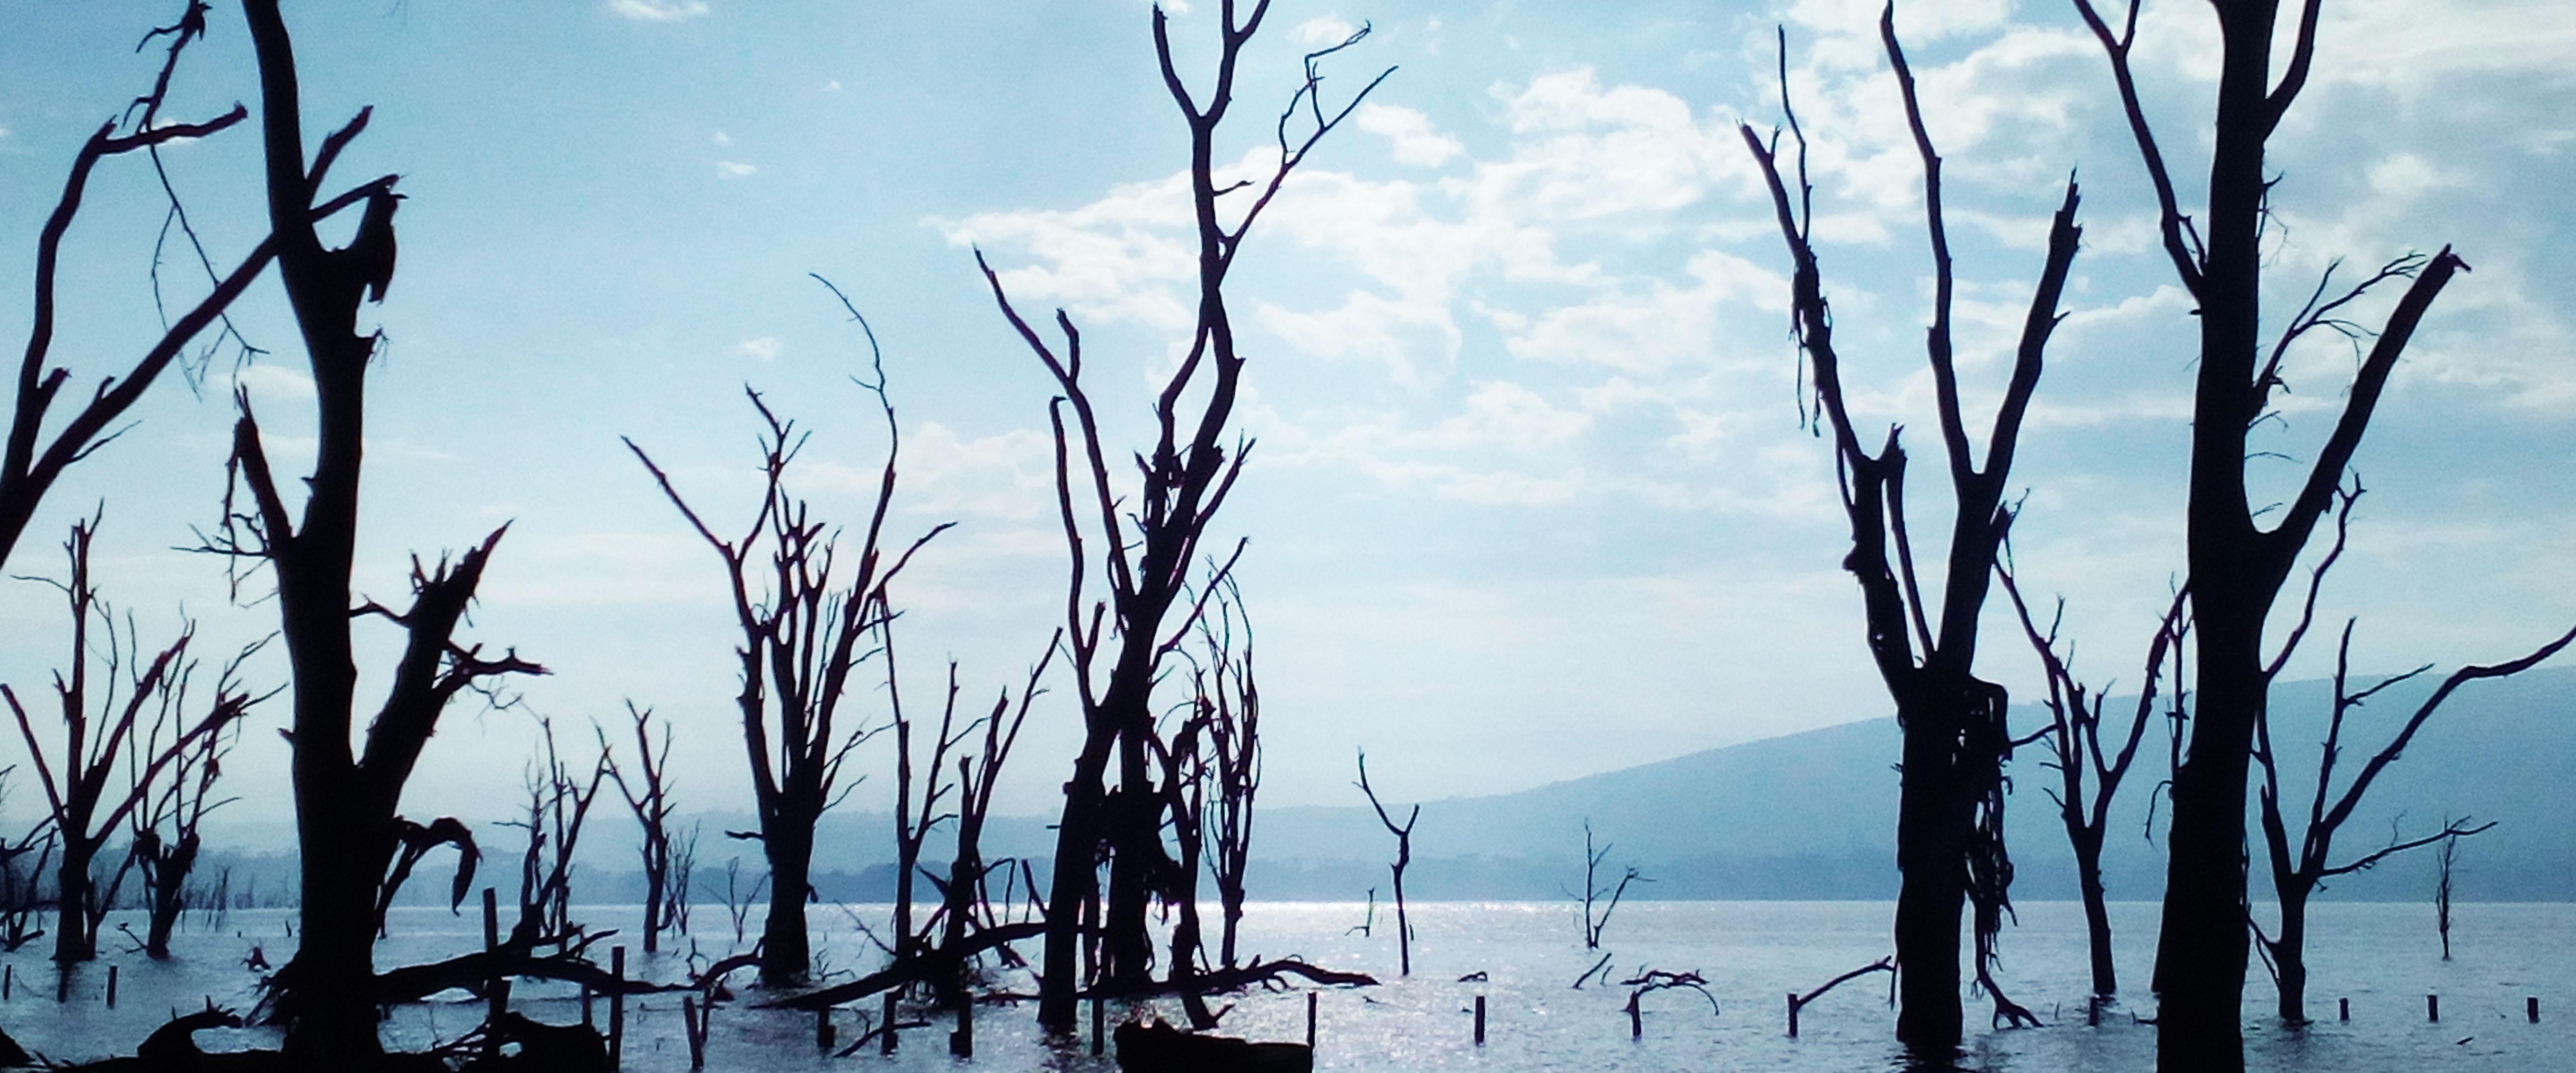 Nakuru lago esondazione Kenya Mani Tese 2017